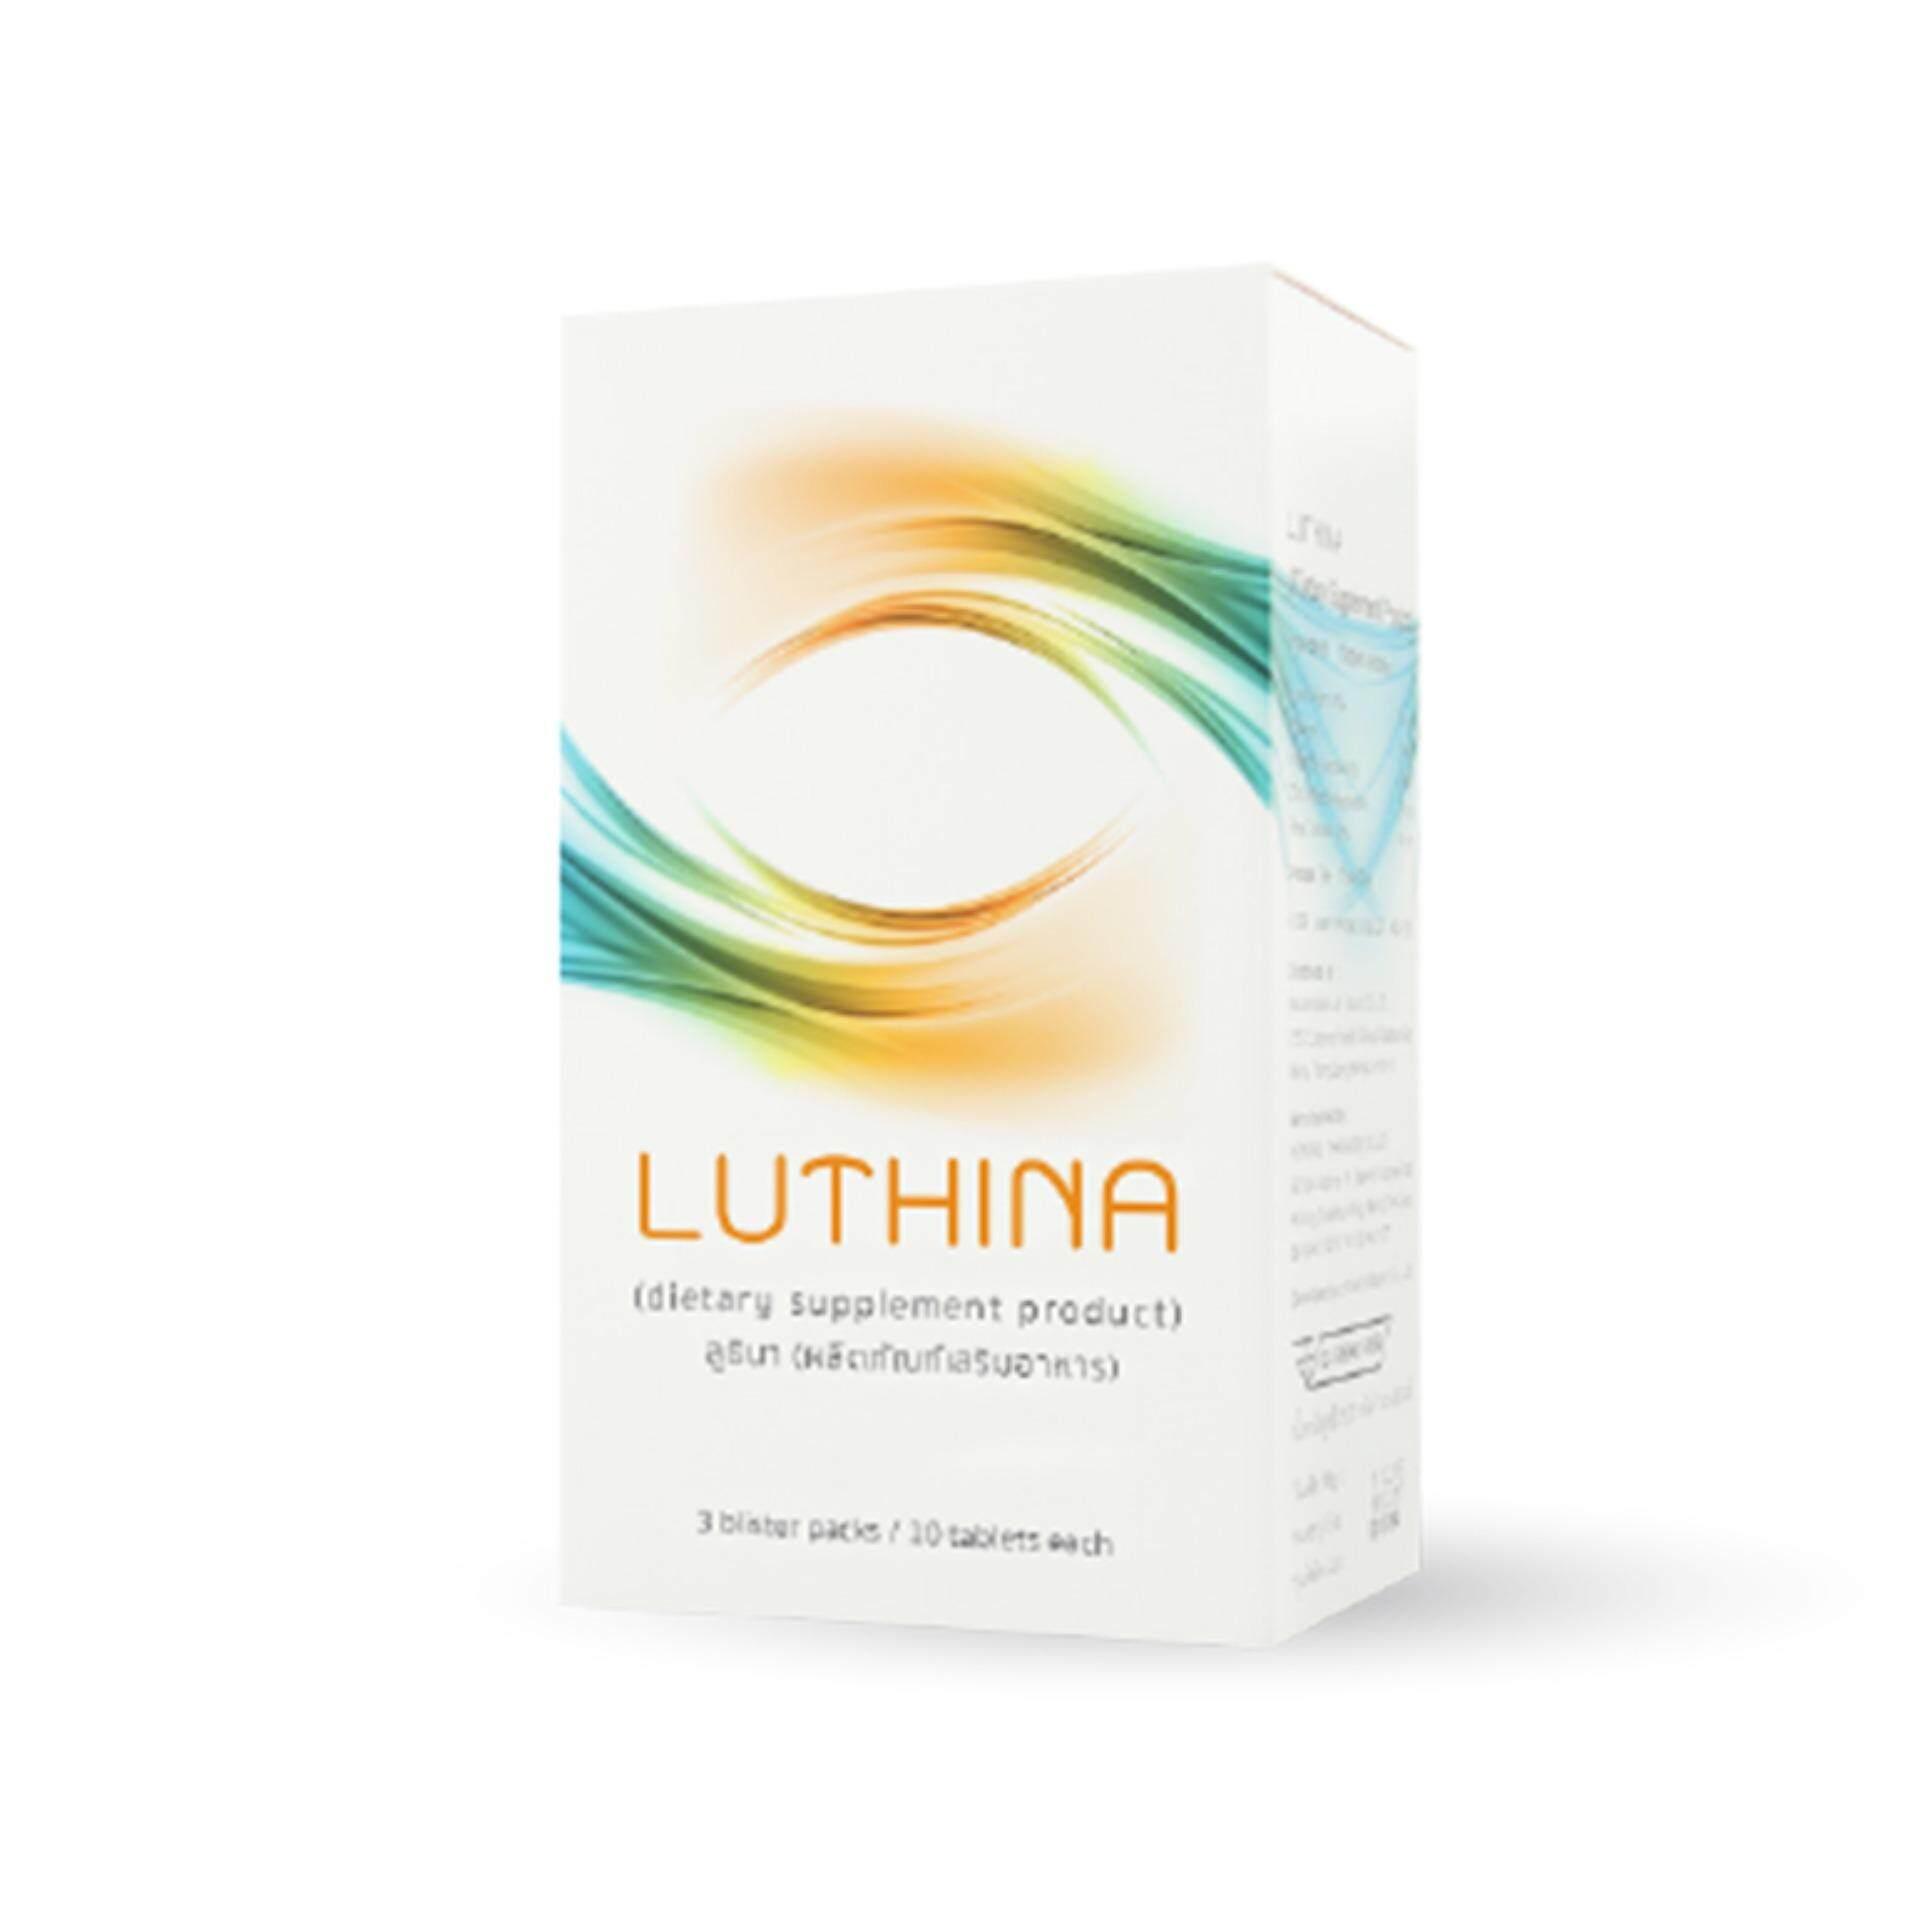 Luthina ลูทินา บำรุงระบบสายตา By Onew Shop.